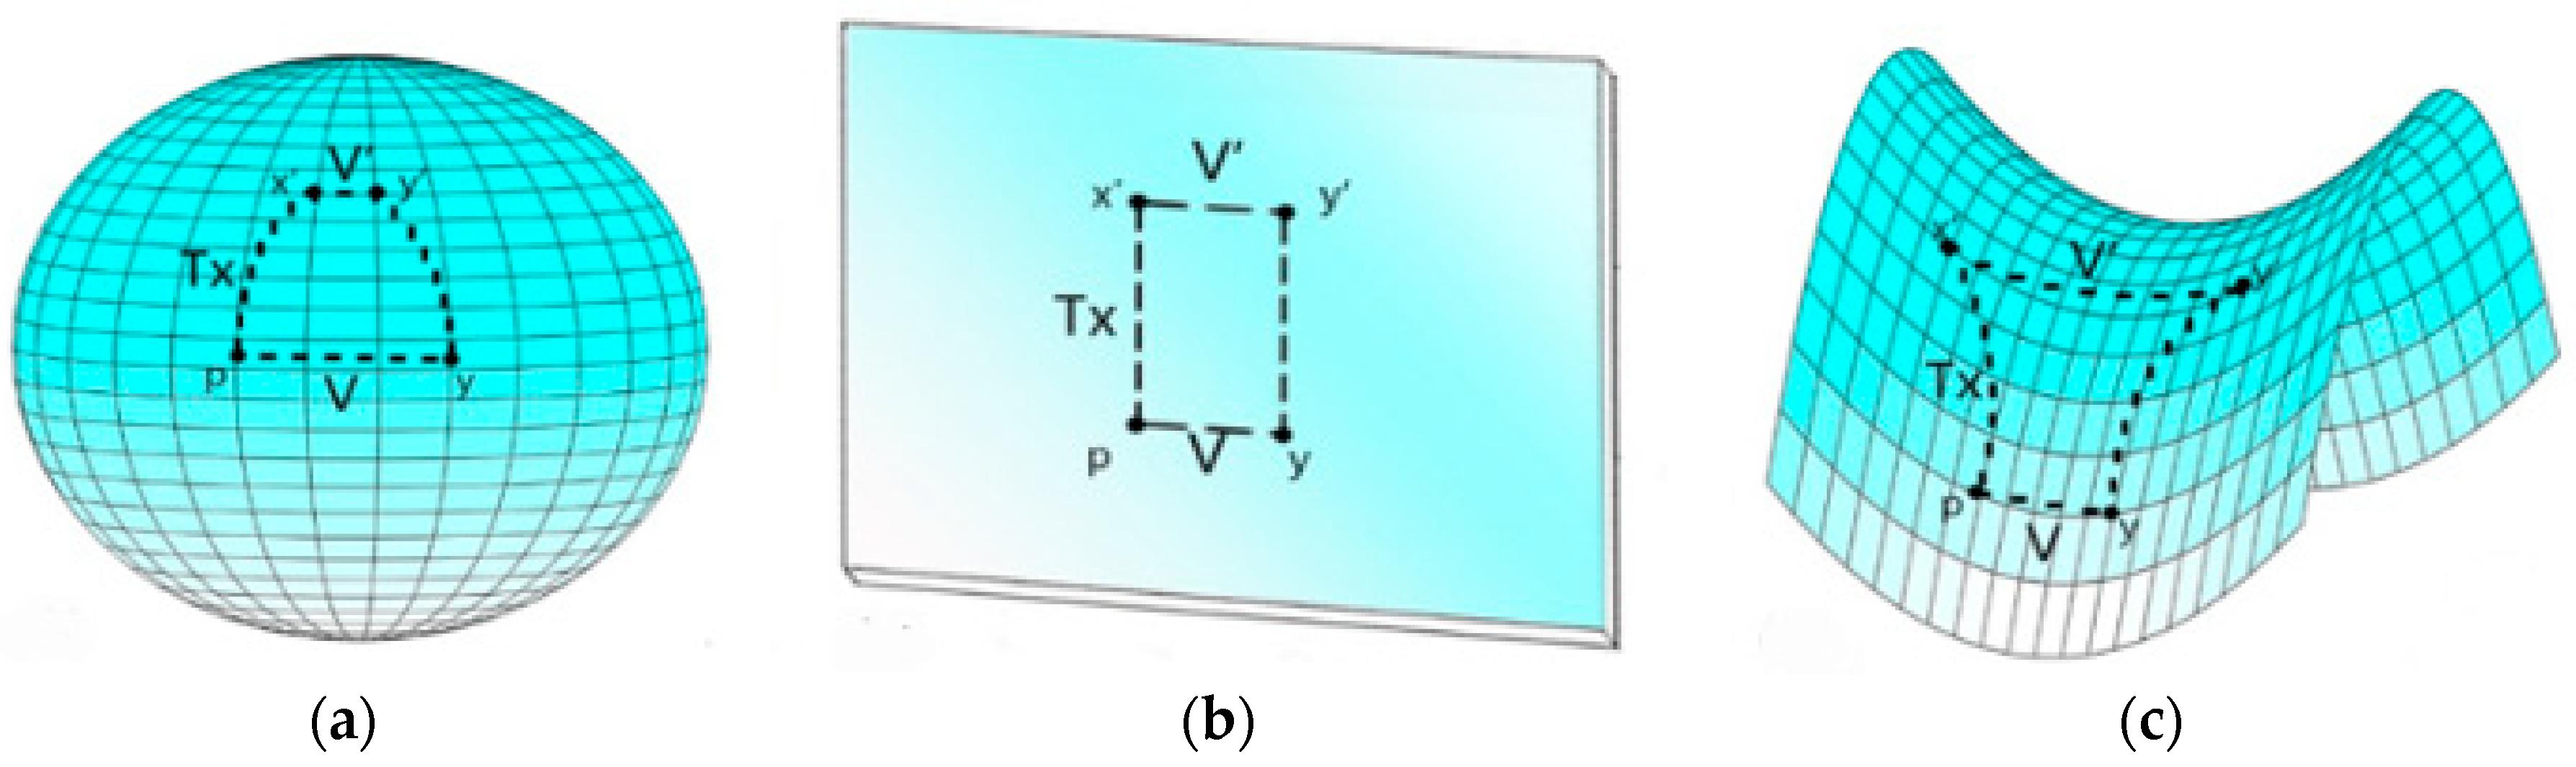 Symmetry | Free Full-Text | Hyperbolic Function Embedding: Learning